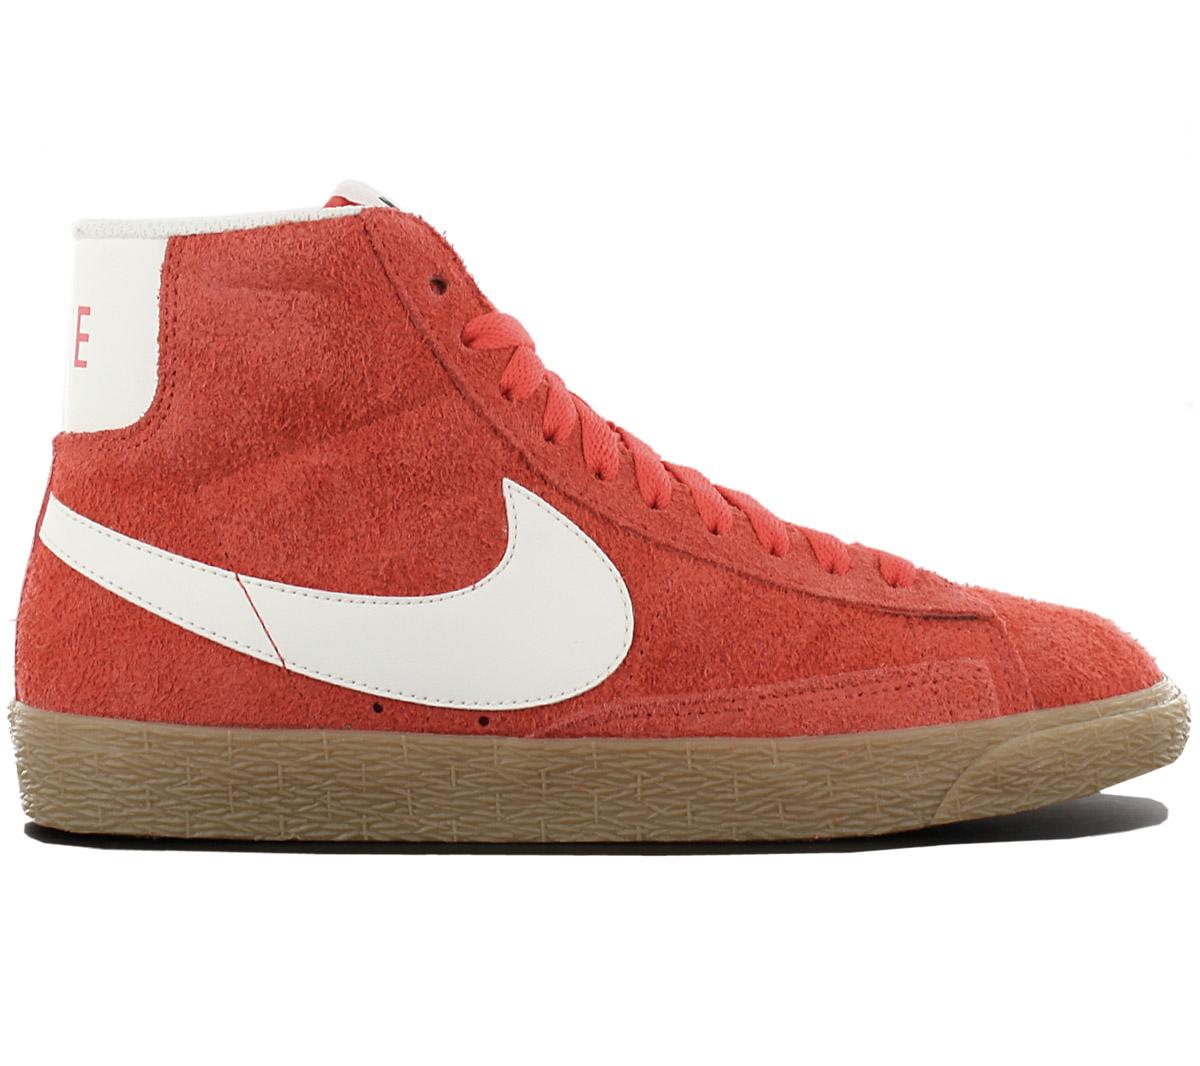 Nike Blazer Mid Damen Turnschuhe Sneaker Schuhe Retro Fashion Turnschuhe Damen Freizeit Leder NEU dd881f